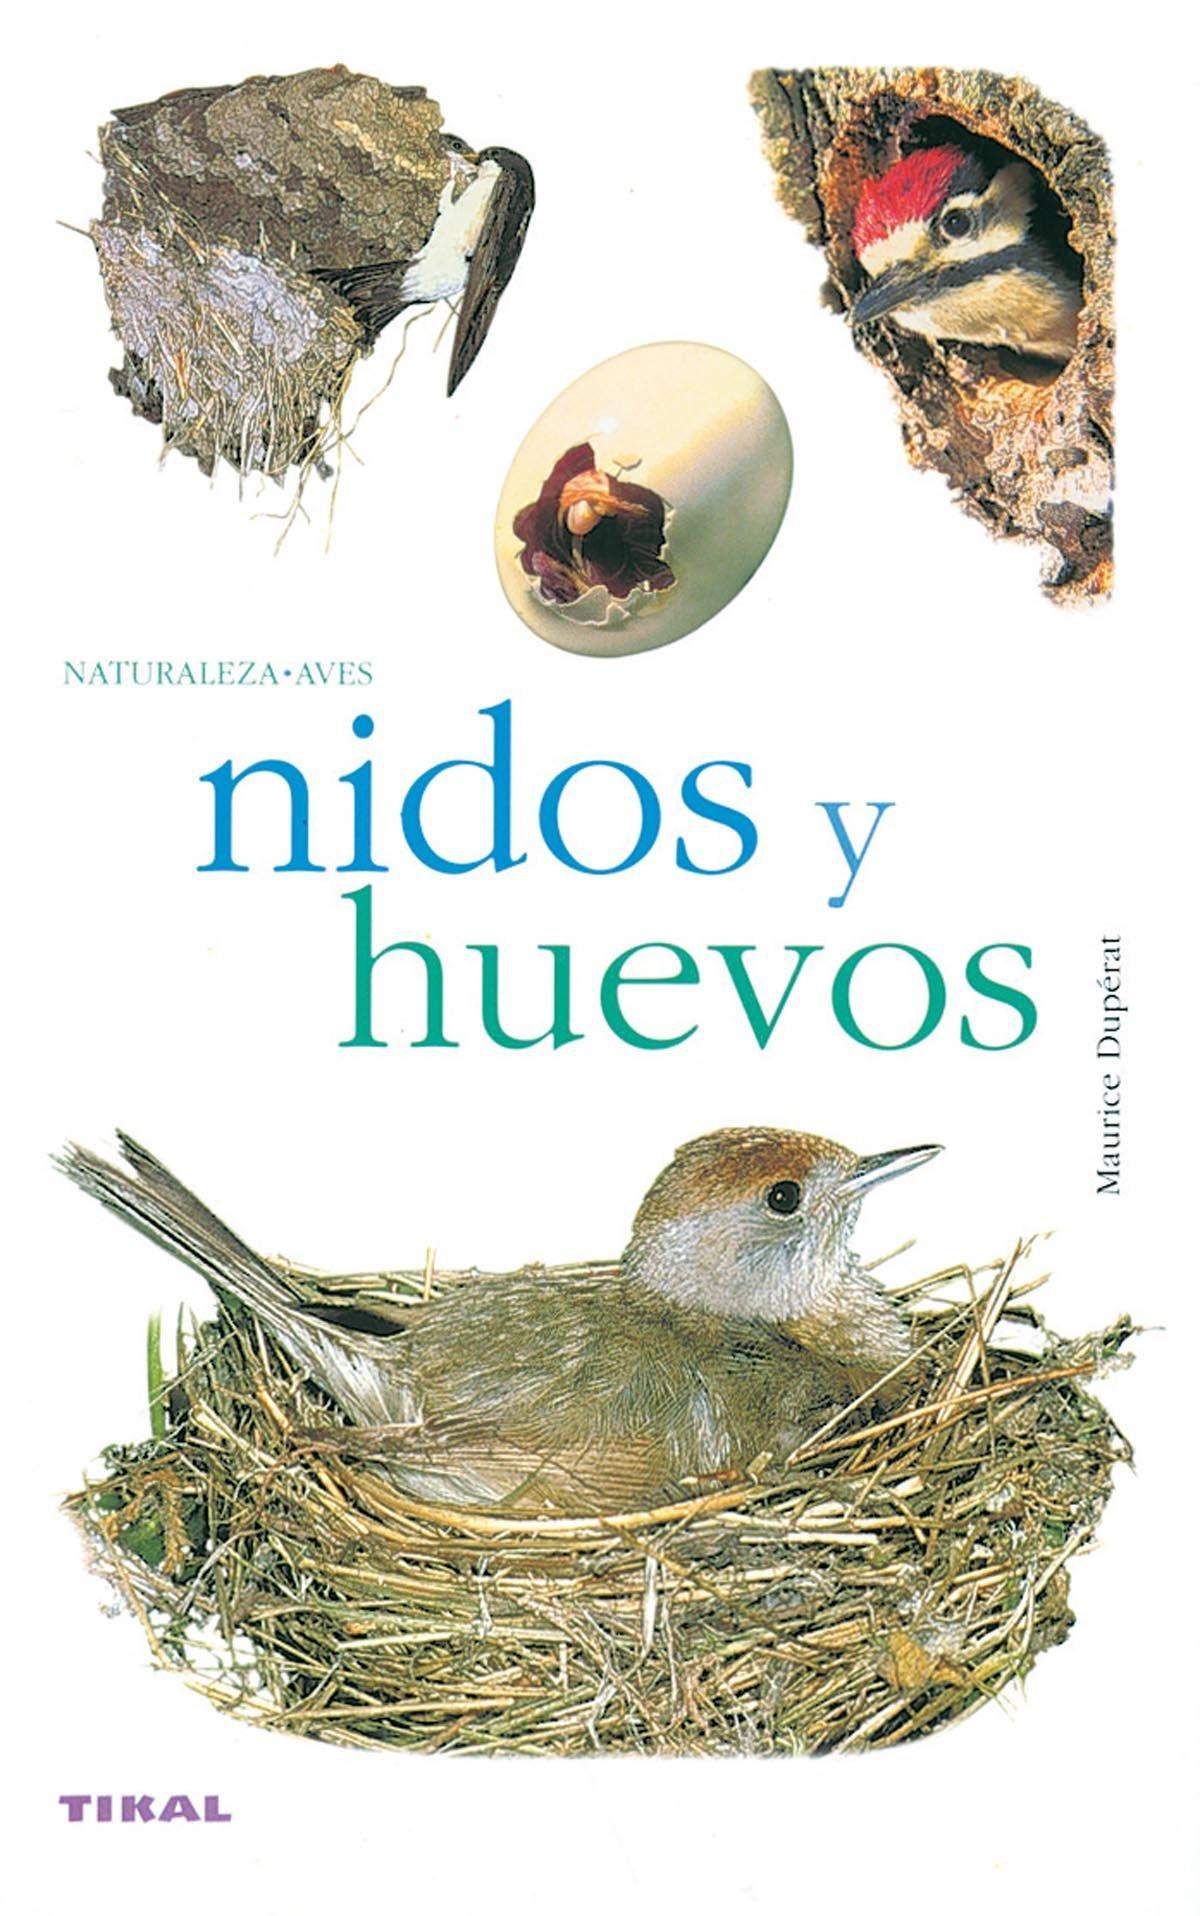 Nidos Y Huevos Naturaleza-Aves de Maurice Duperat 6 feb 2006 Tapa blanda: Amazon.es: Libros